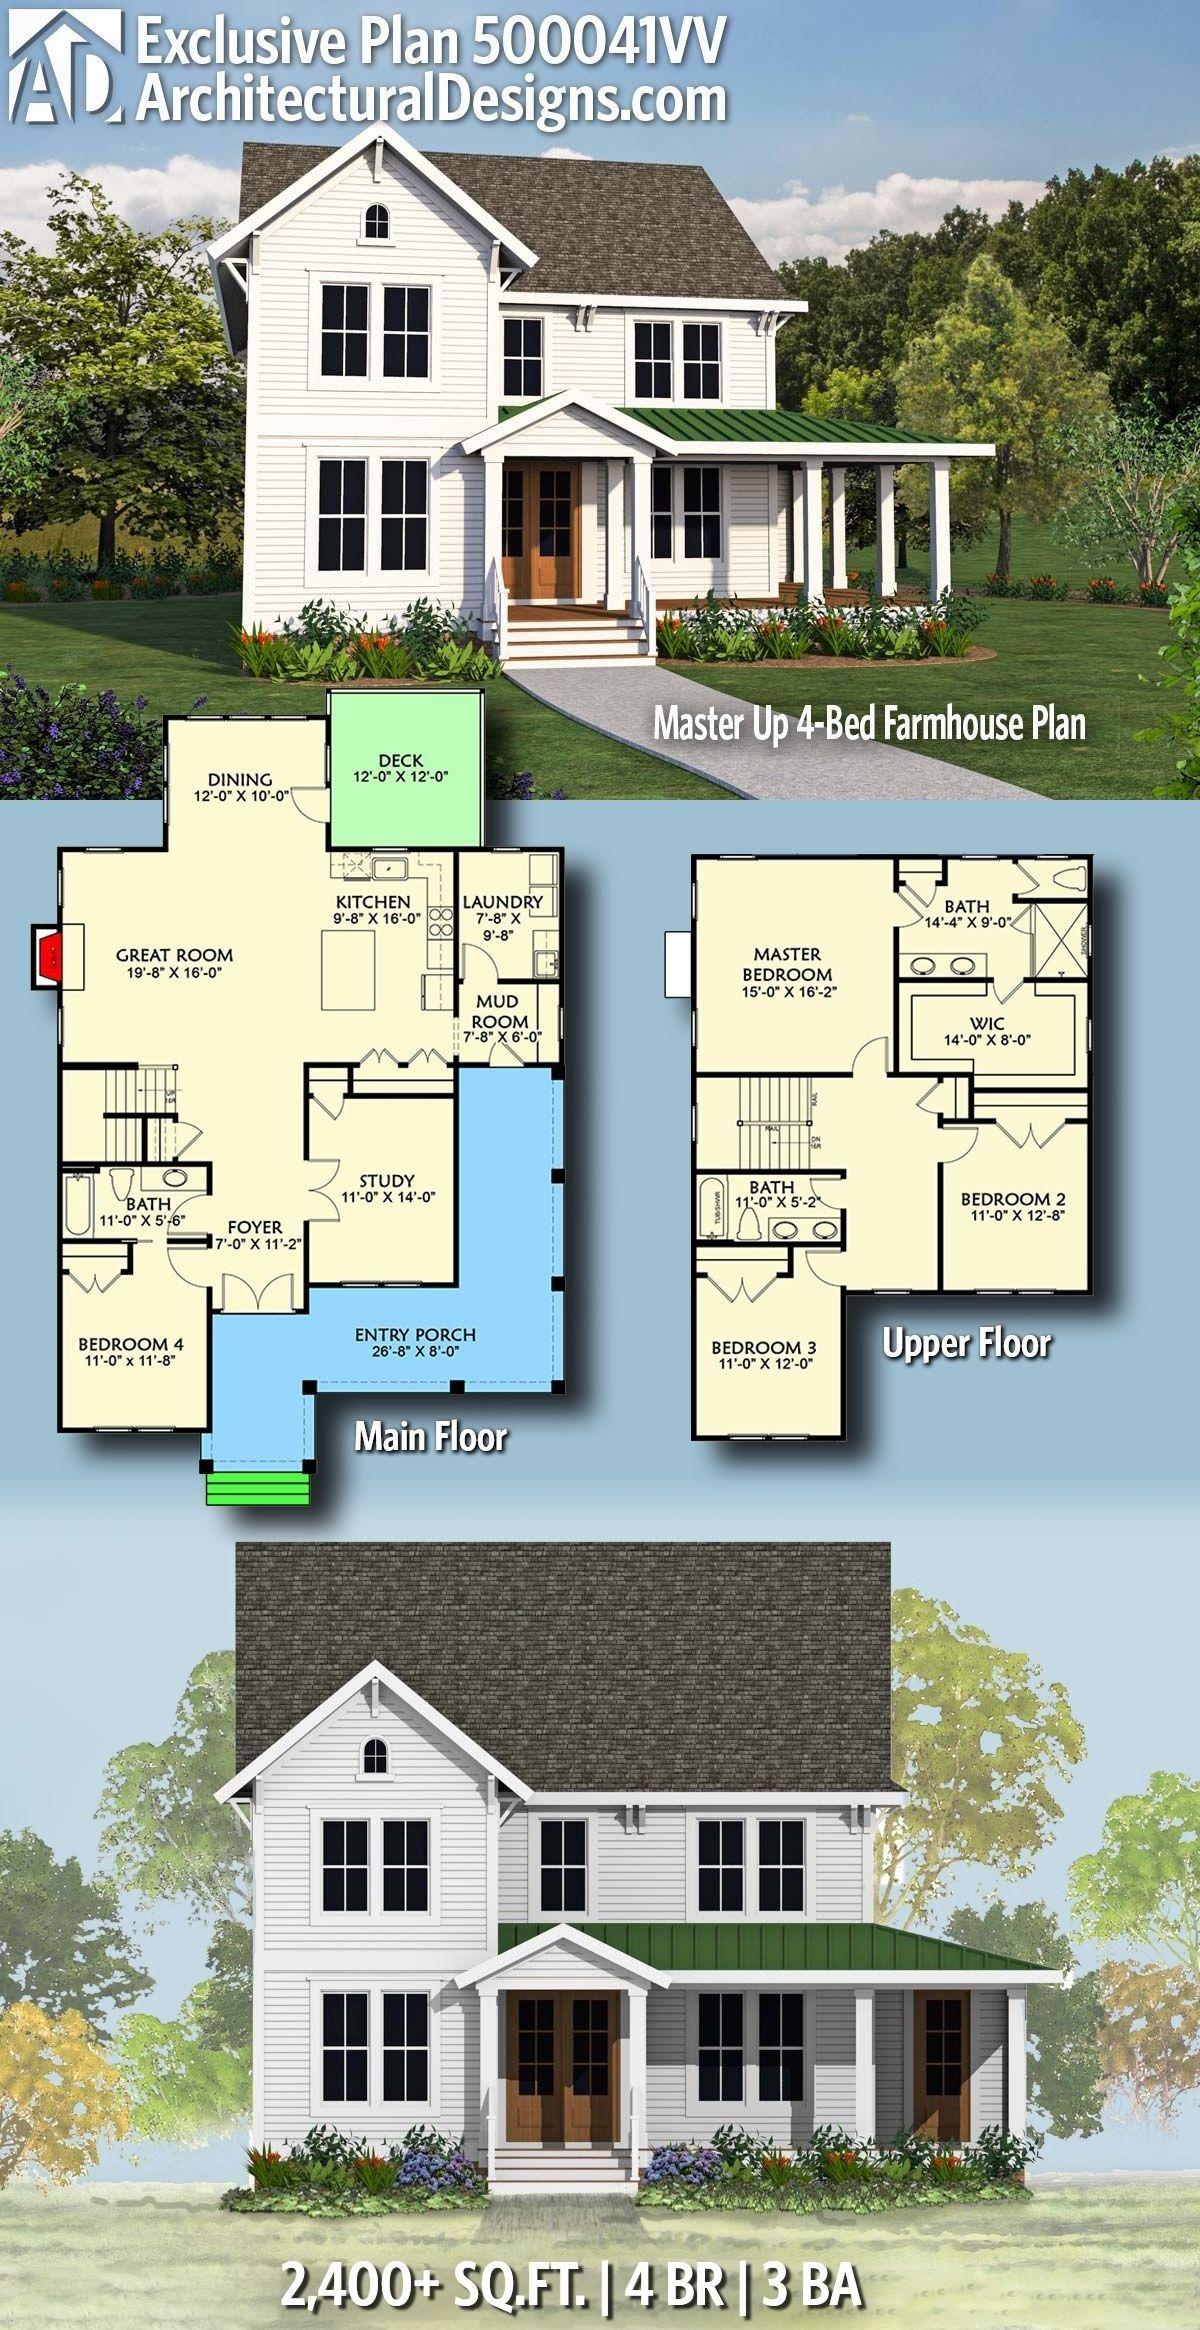 32 Amazing Modern Farmhouse Design House Plans Ideas Farmhouse Layout House Plans Farmhouse House Plans